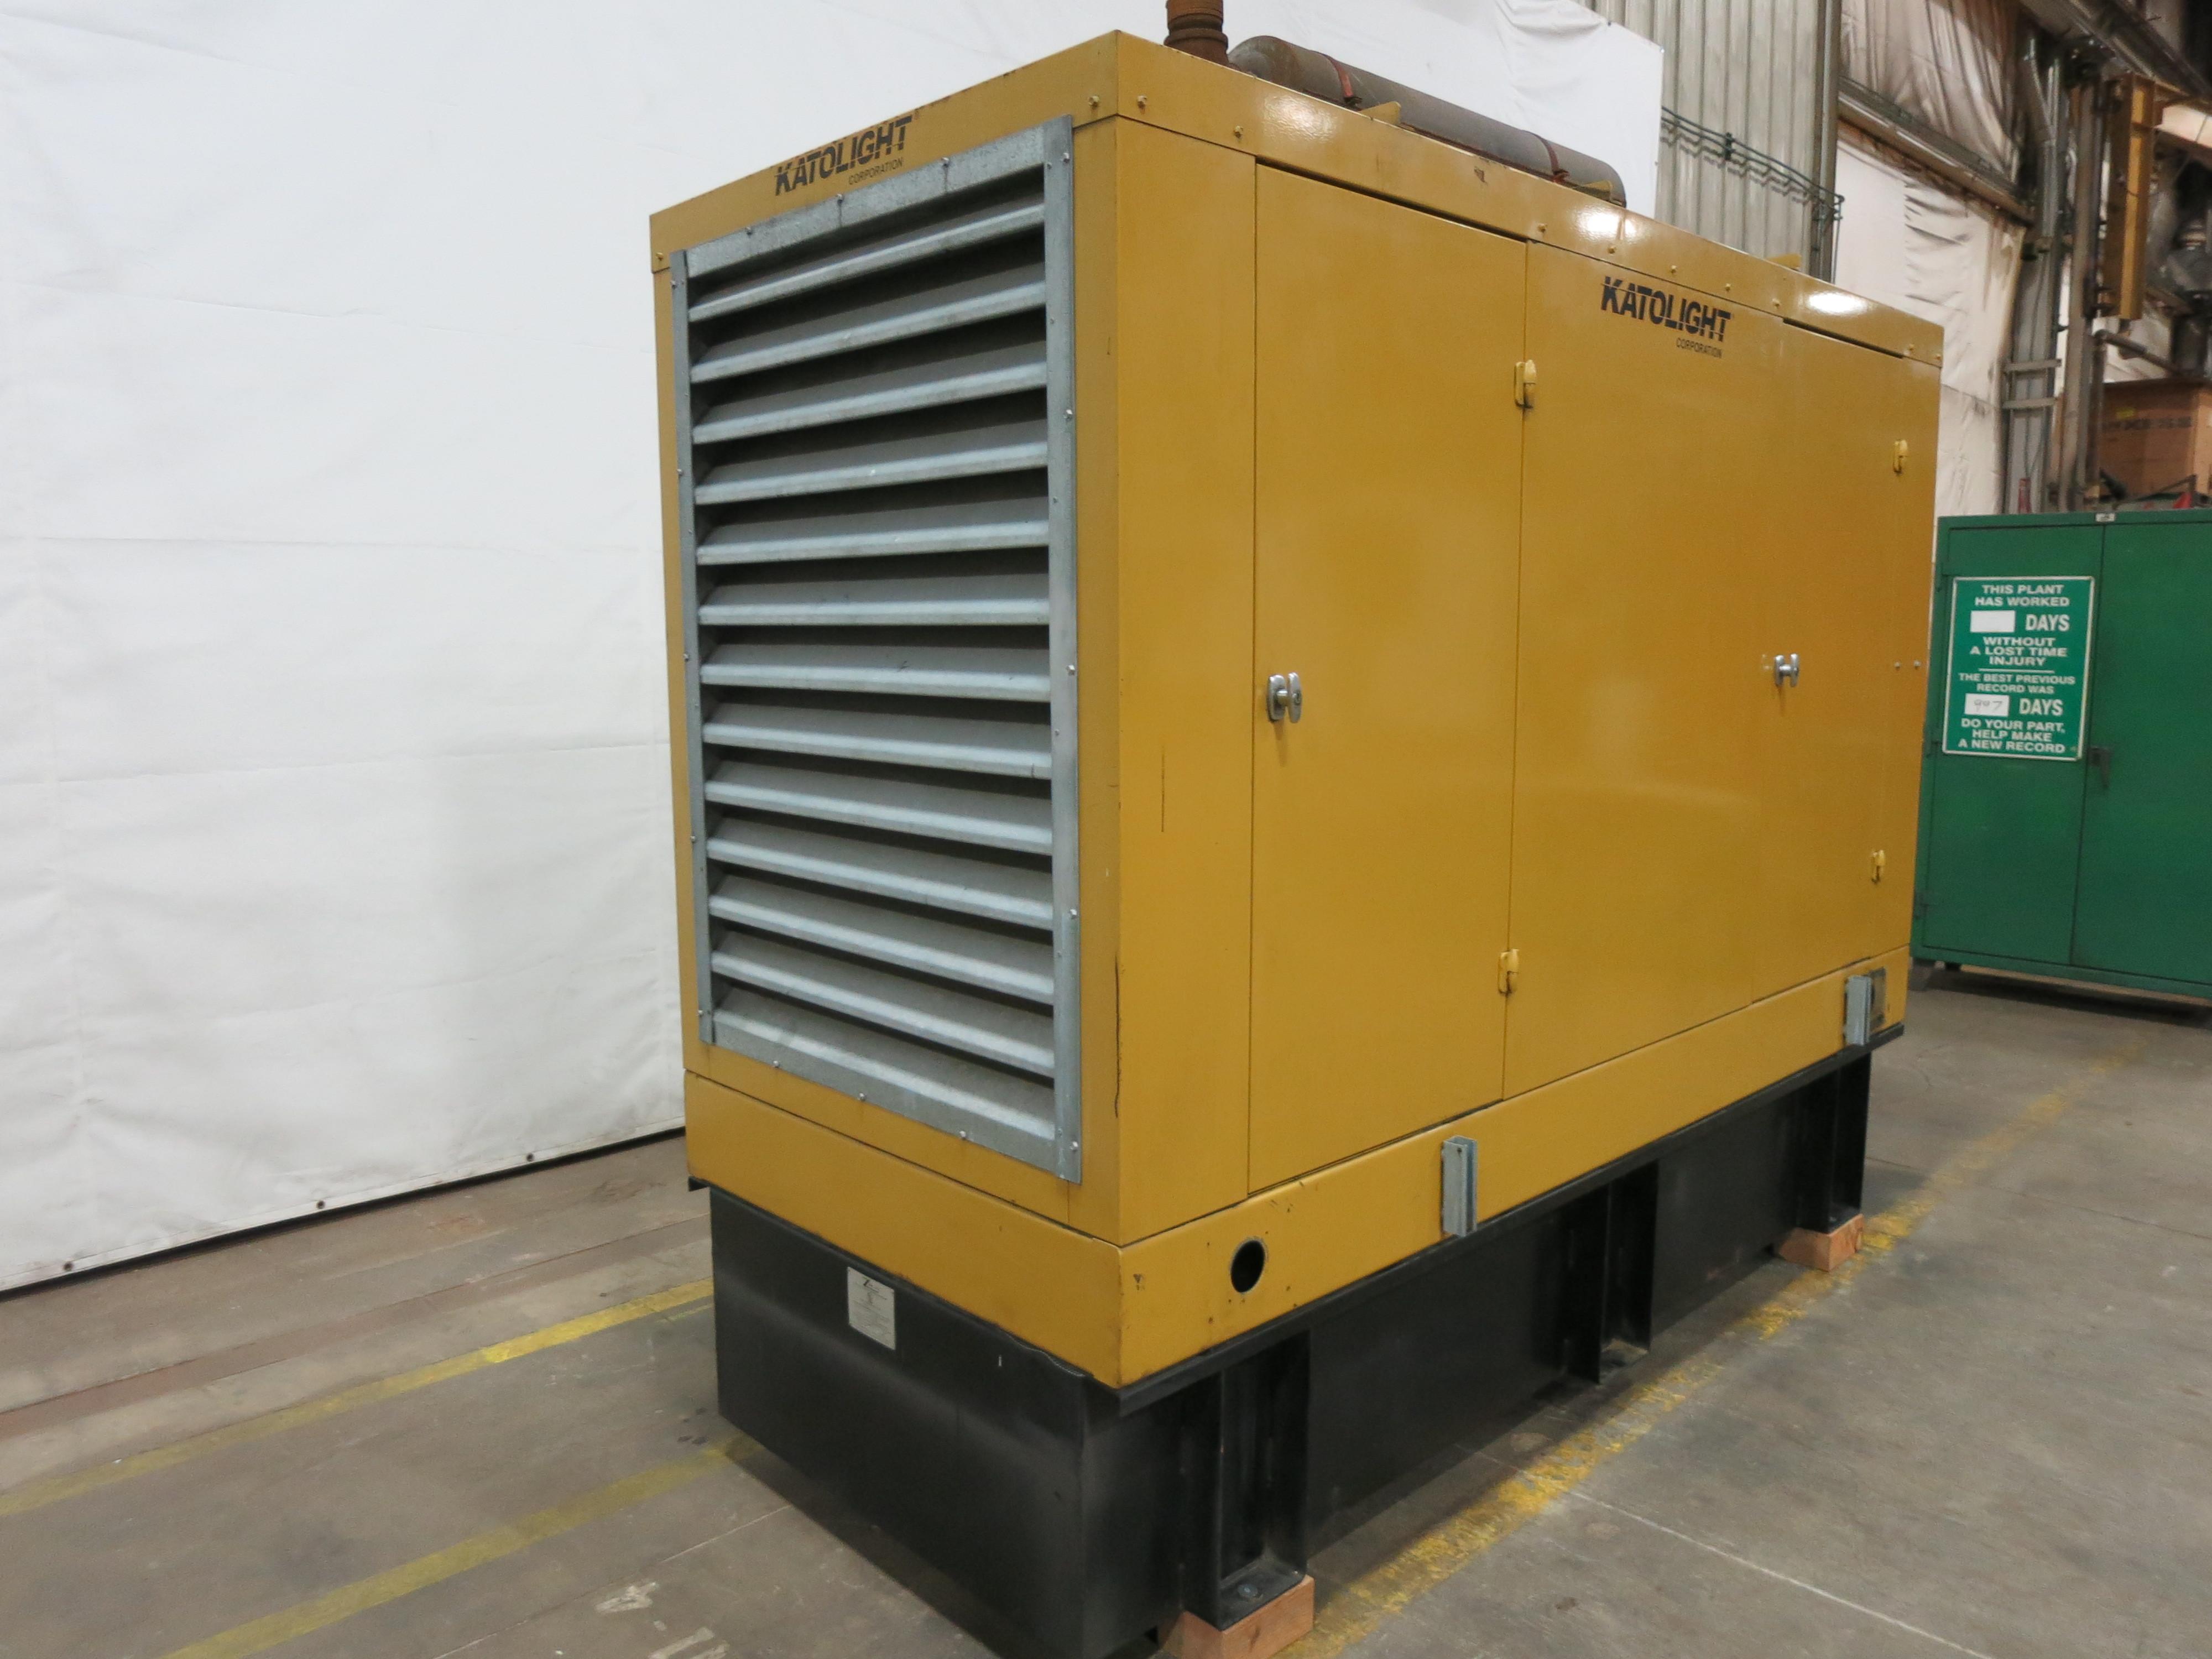 Used Katolight D125fjj4 Diesel Generator 313 Hrs 125 Kw 0 Wiring Diagram Price Csdg